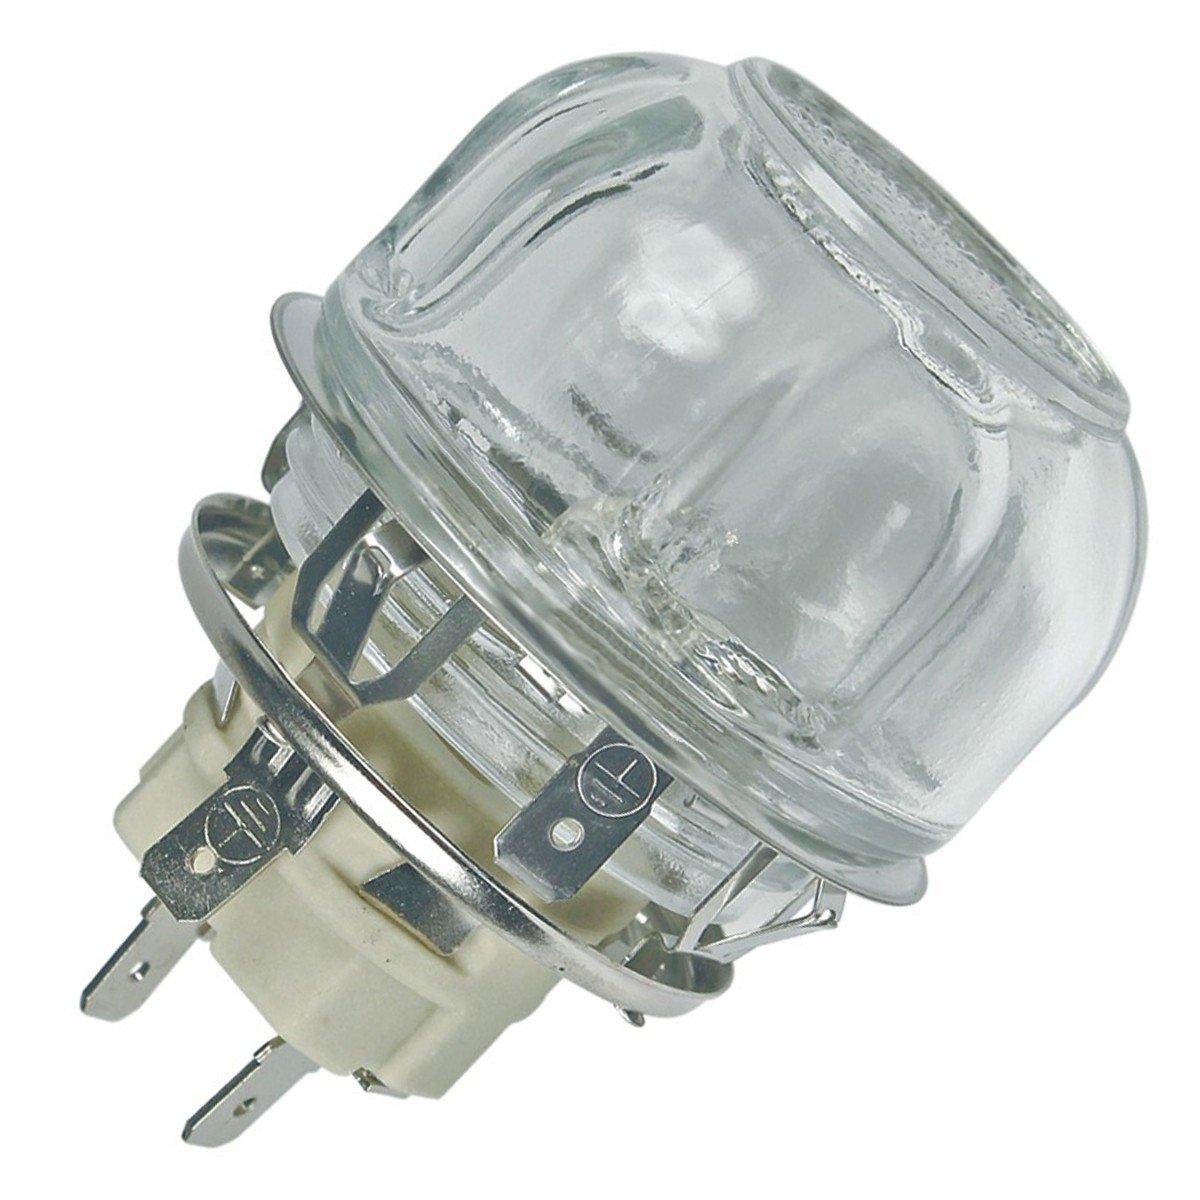 ZANUSSI FAURE JUNO ELECTROLUX AEG Lampe compl/ète Four cuisini/ère 3192560013 ARTHUR MARTIN ELECTROLUX